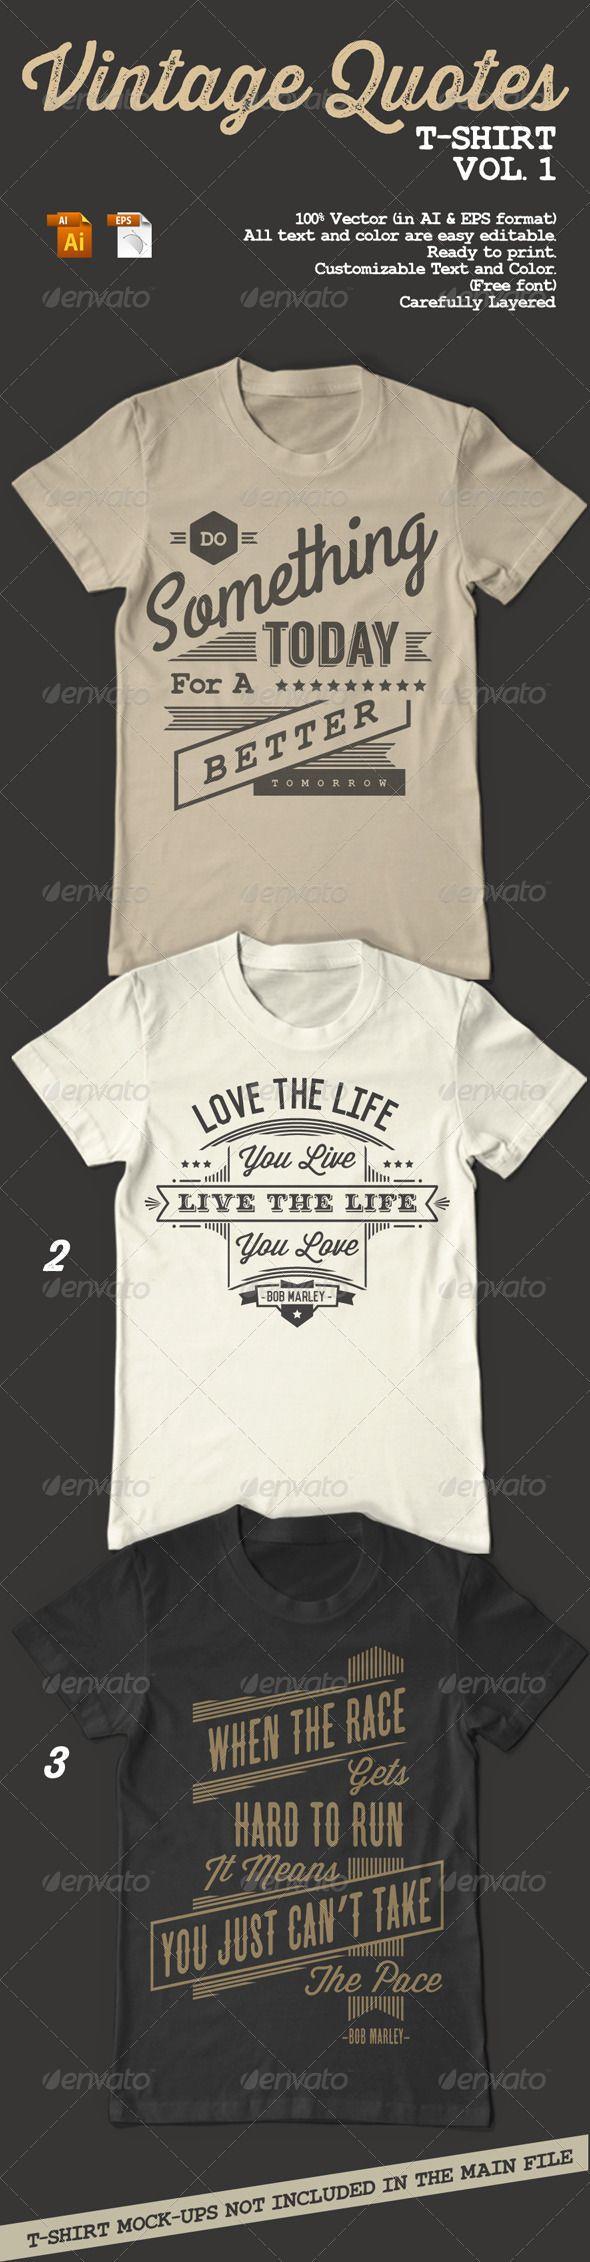 Vintage Quotes T-Shirt Vol. 1